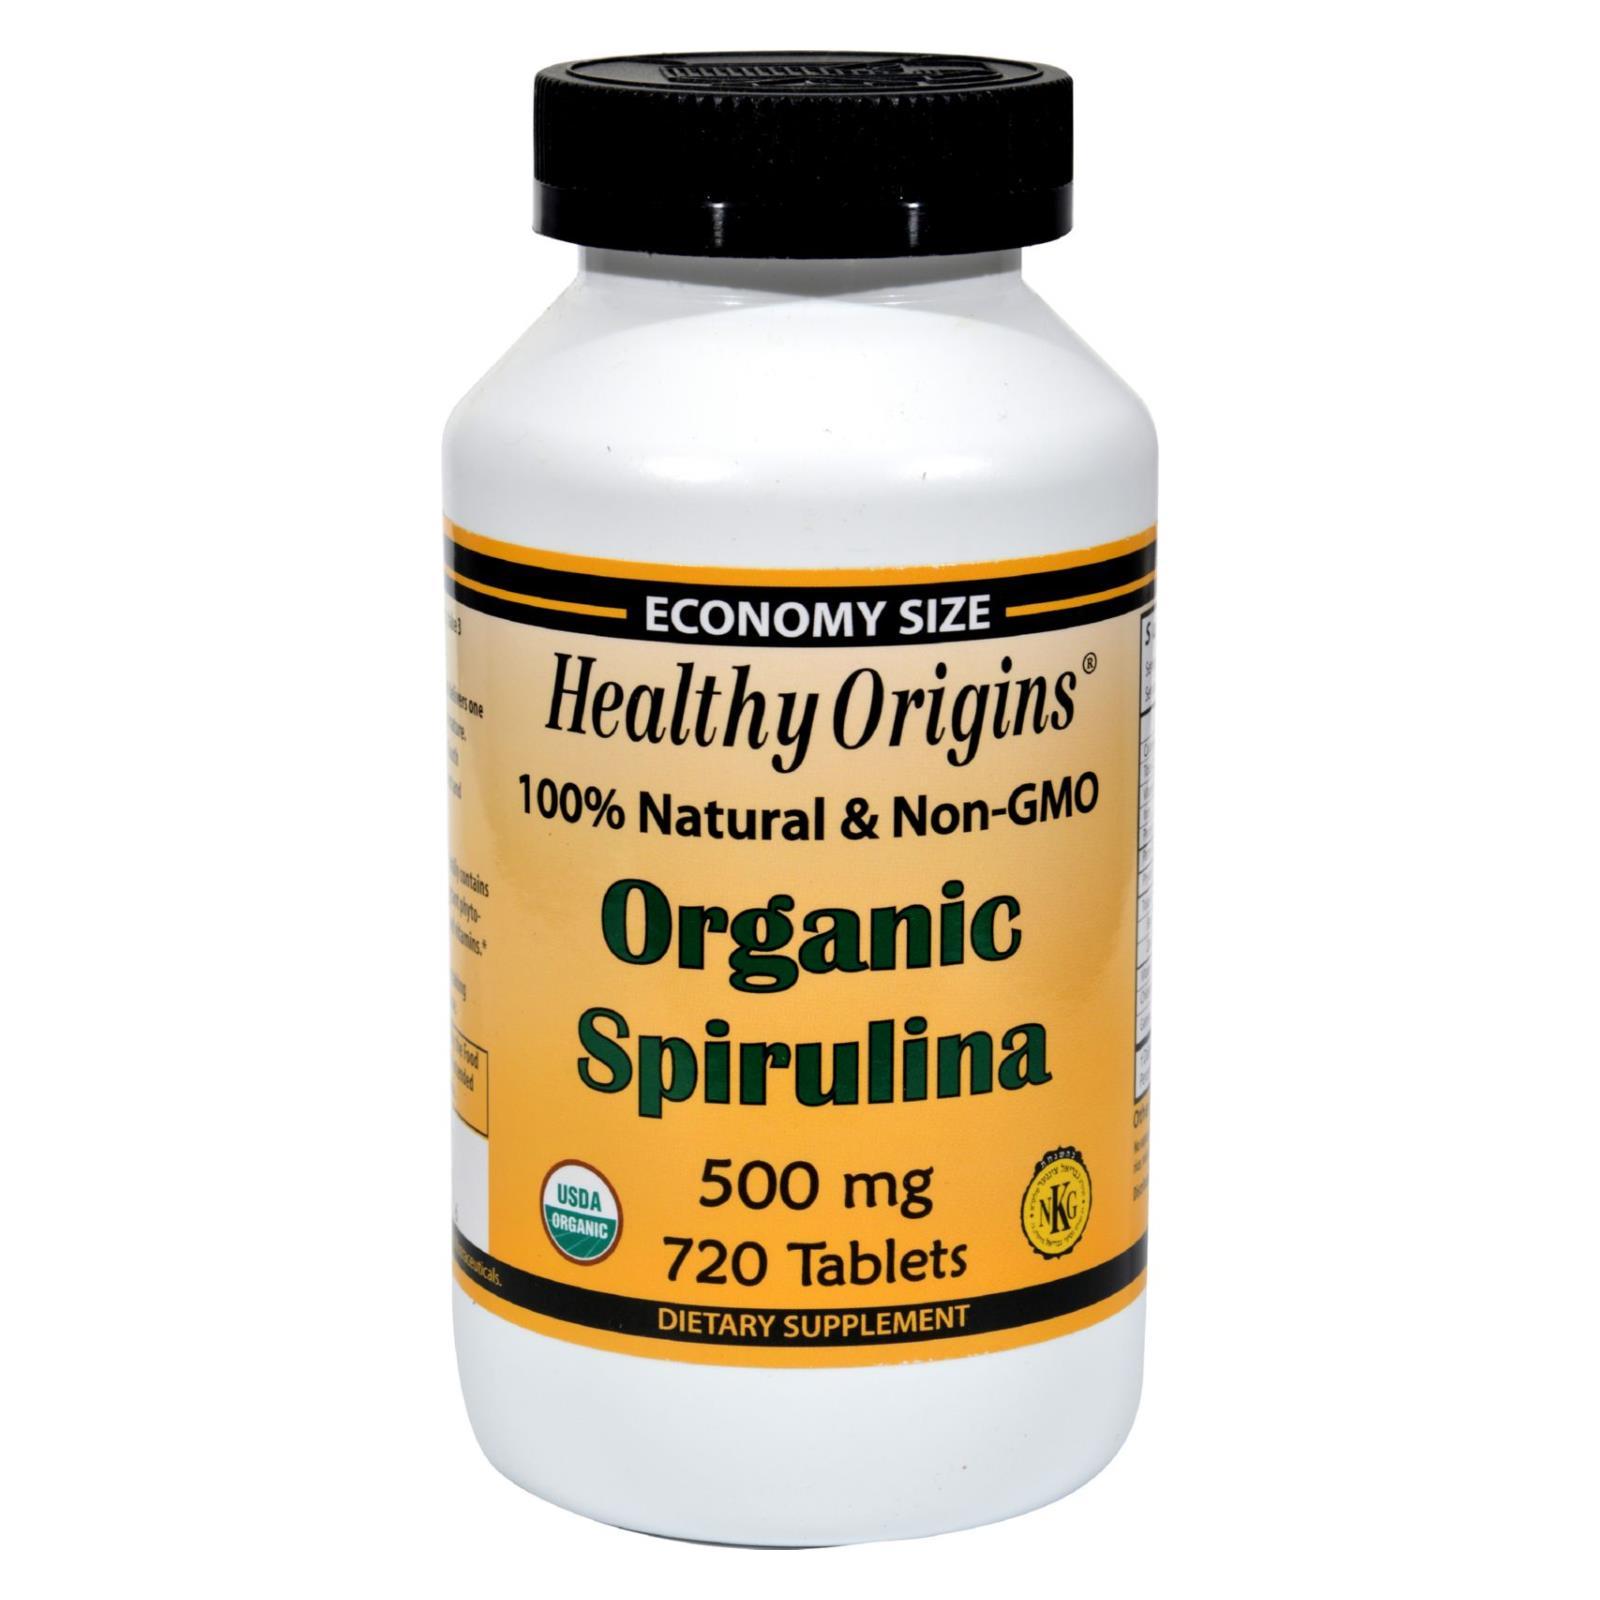 Healthy Origins Organic Spirulina - 500 mg - 720 Ct